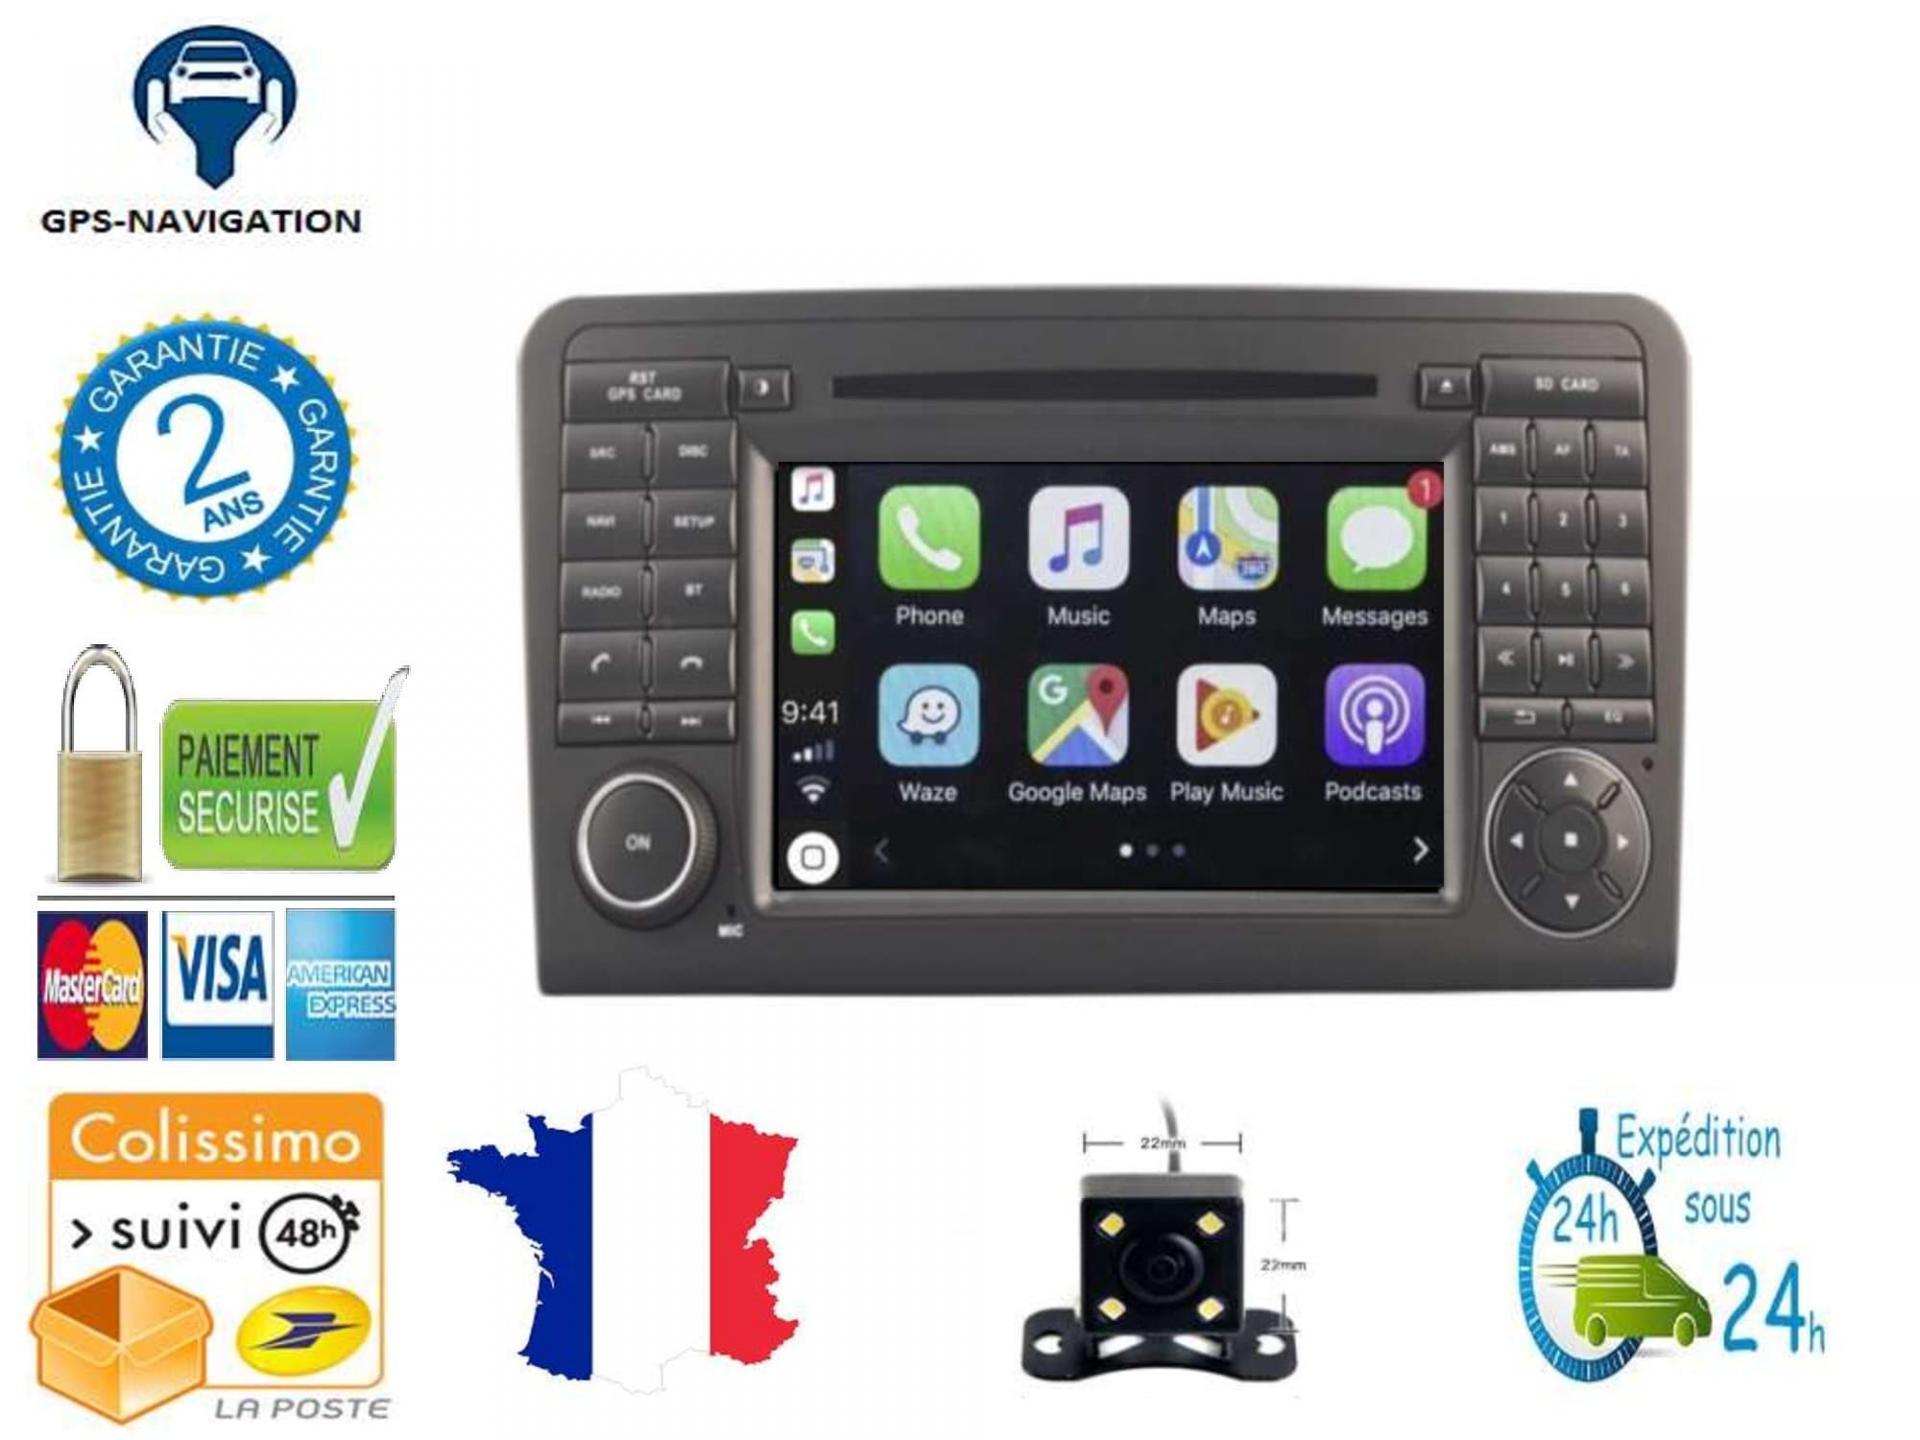 Autoradio gps carplay android auto gps bluetooth mercedes ml w164 2